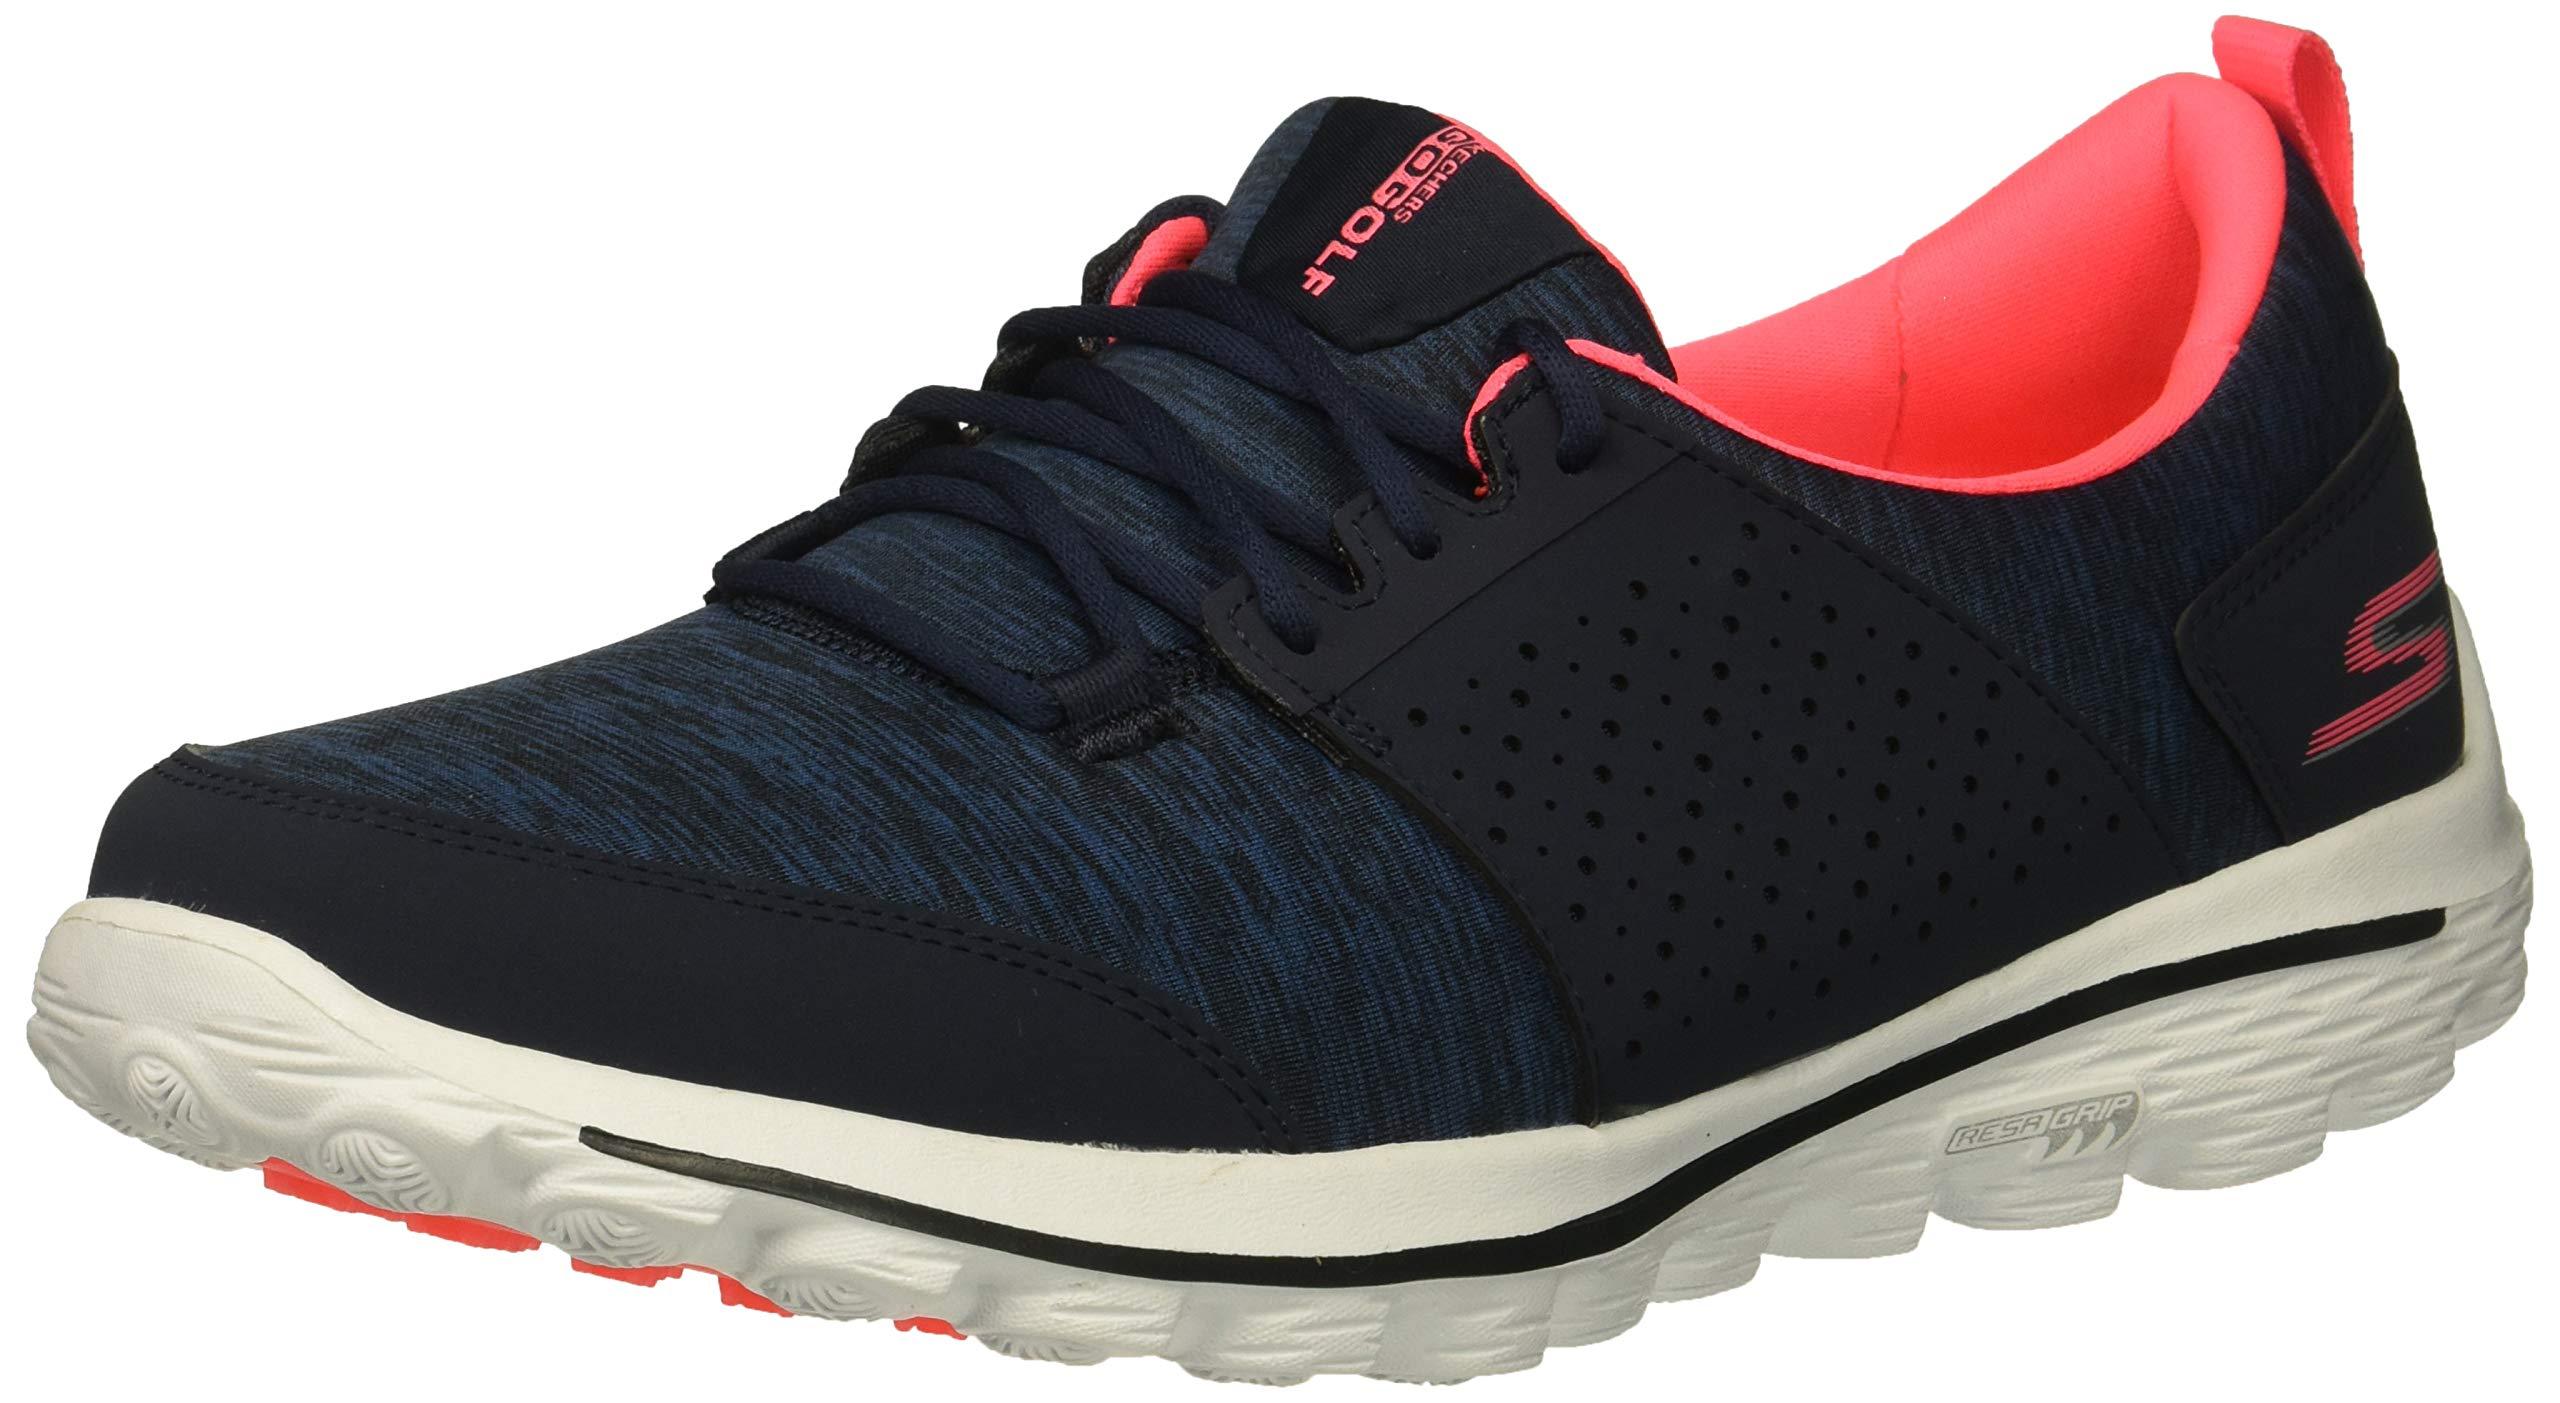 Skechers Women's Go Walk 2 Sugar Relaxed Fit Golf Shoe, Navy/Pink, 9 M US by Skechers